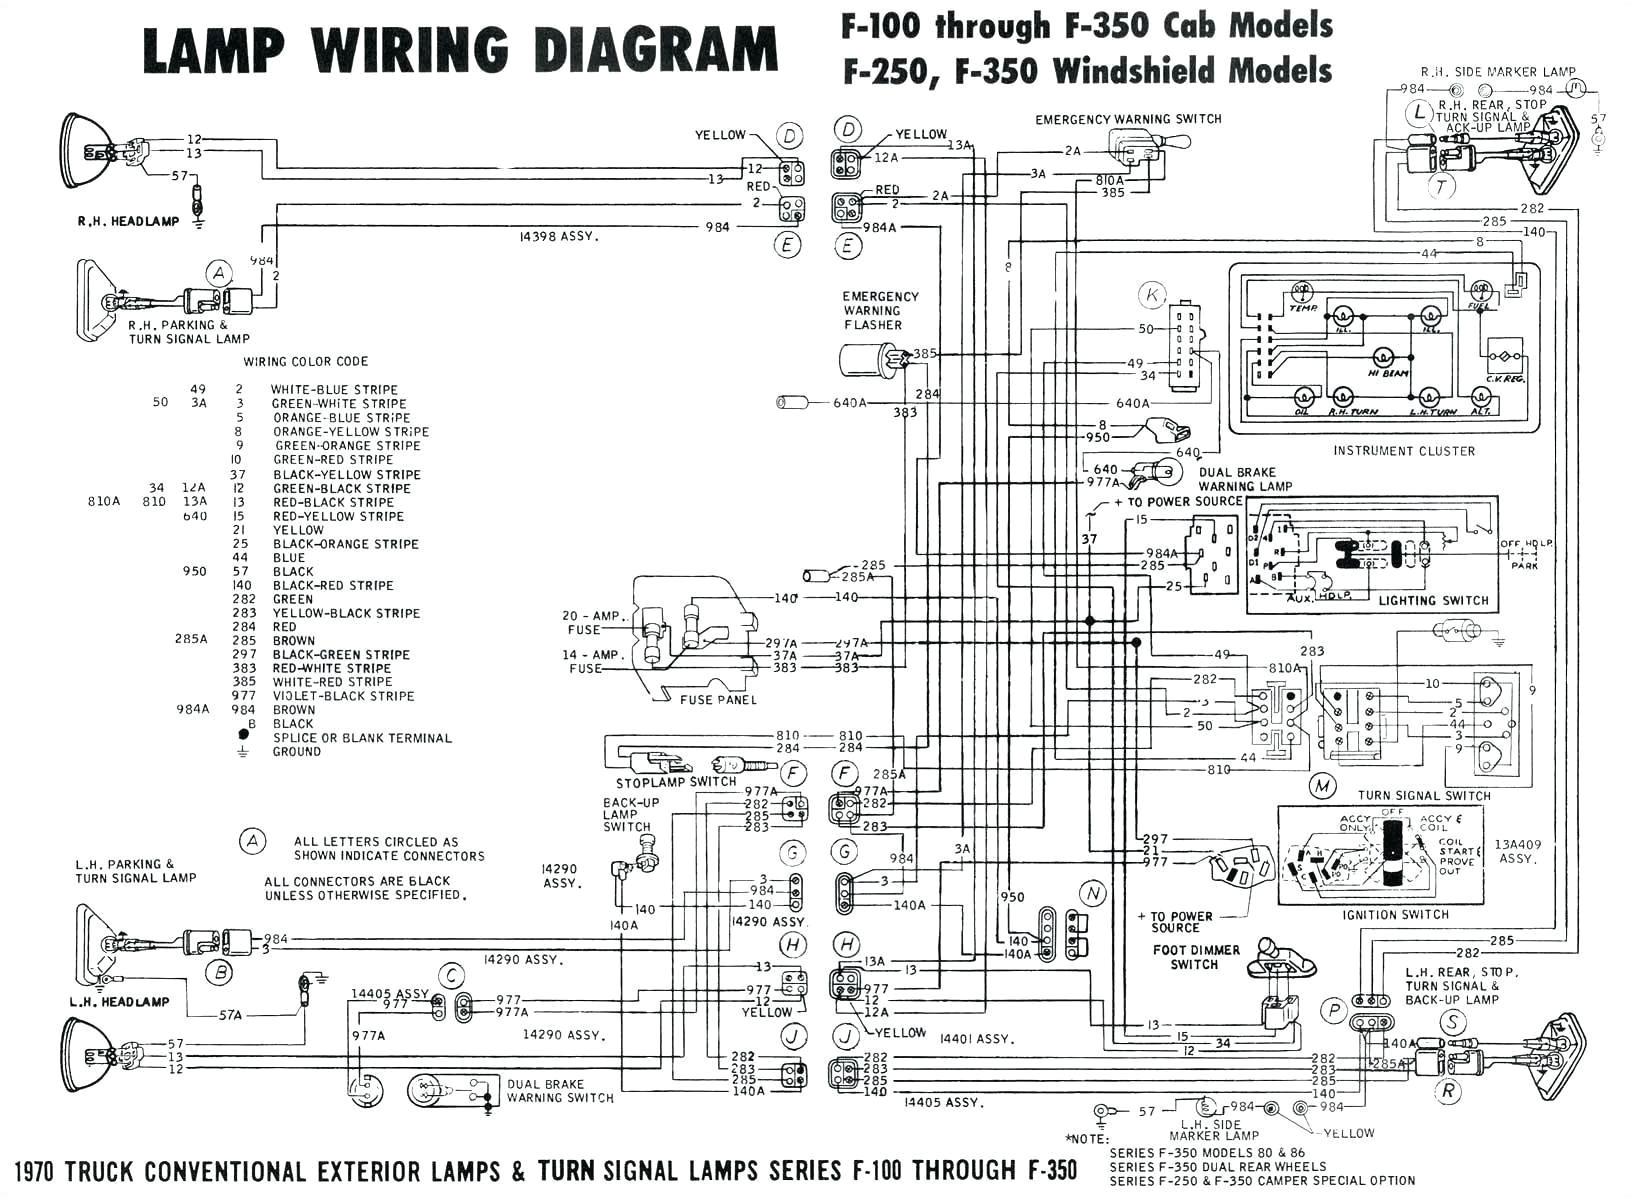 dol motor starter wiring diagram unique soft starter wiring diagram valid wiring diagram dol motor starter